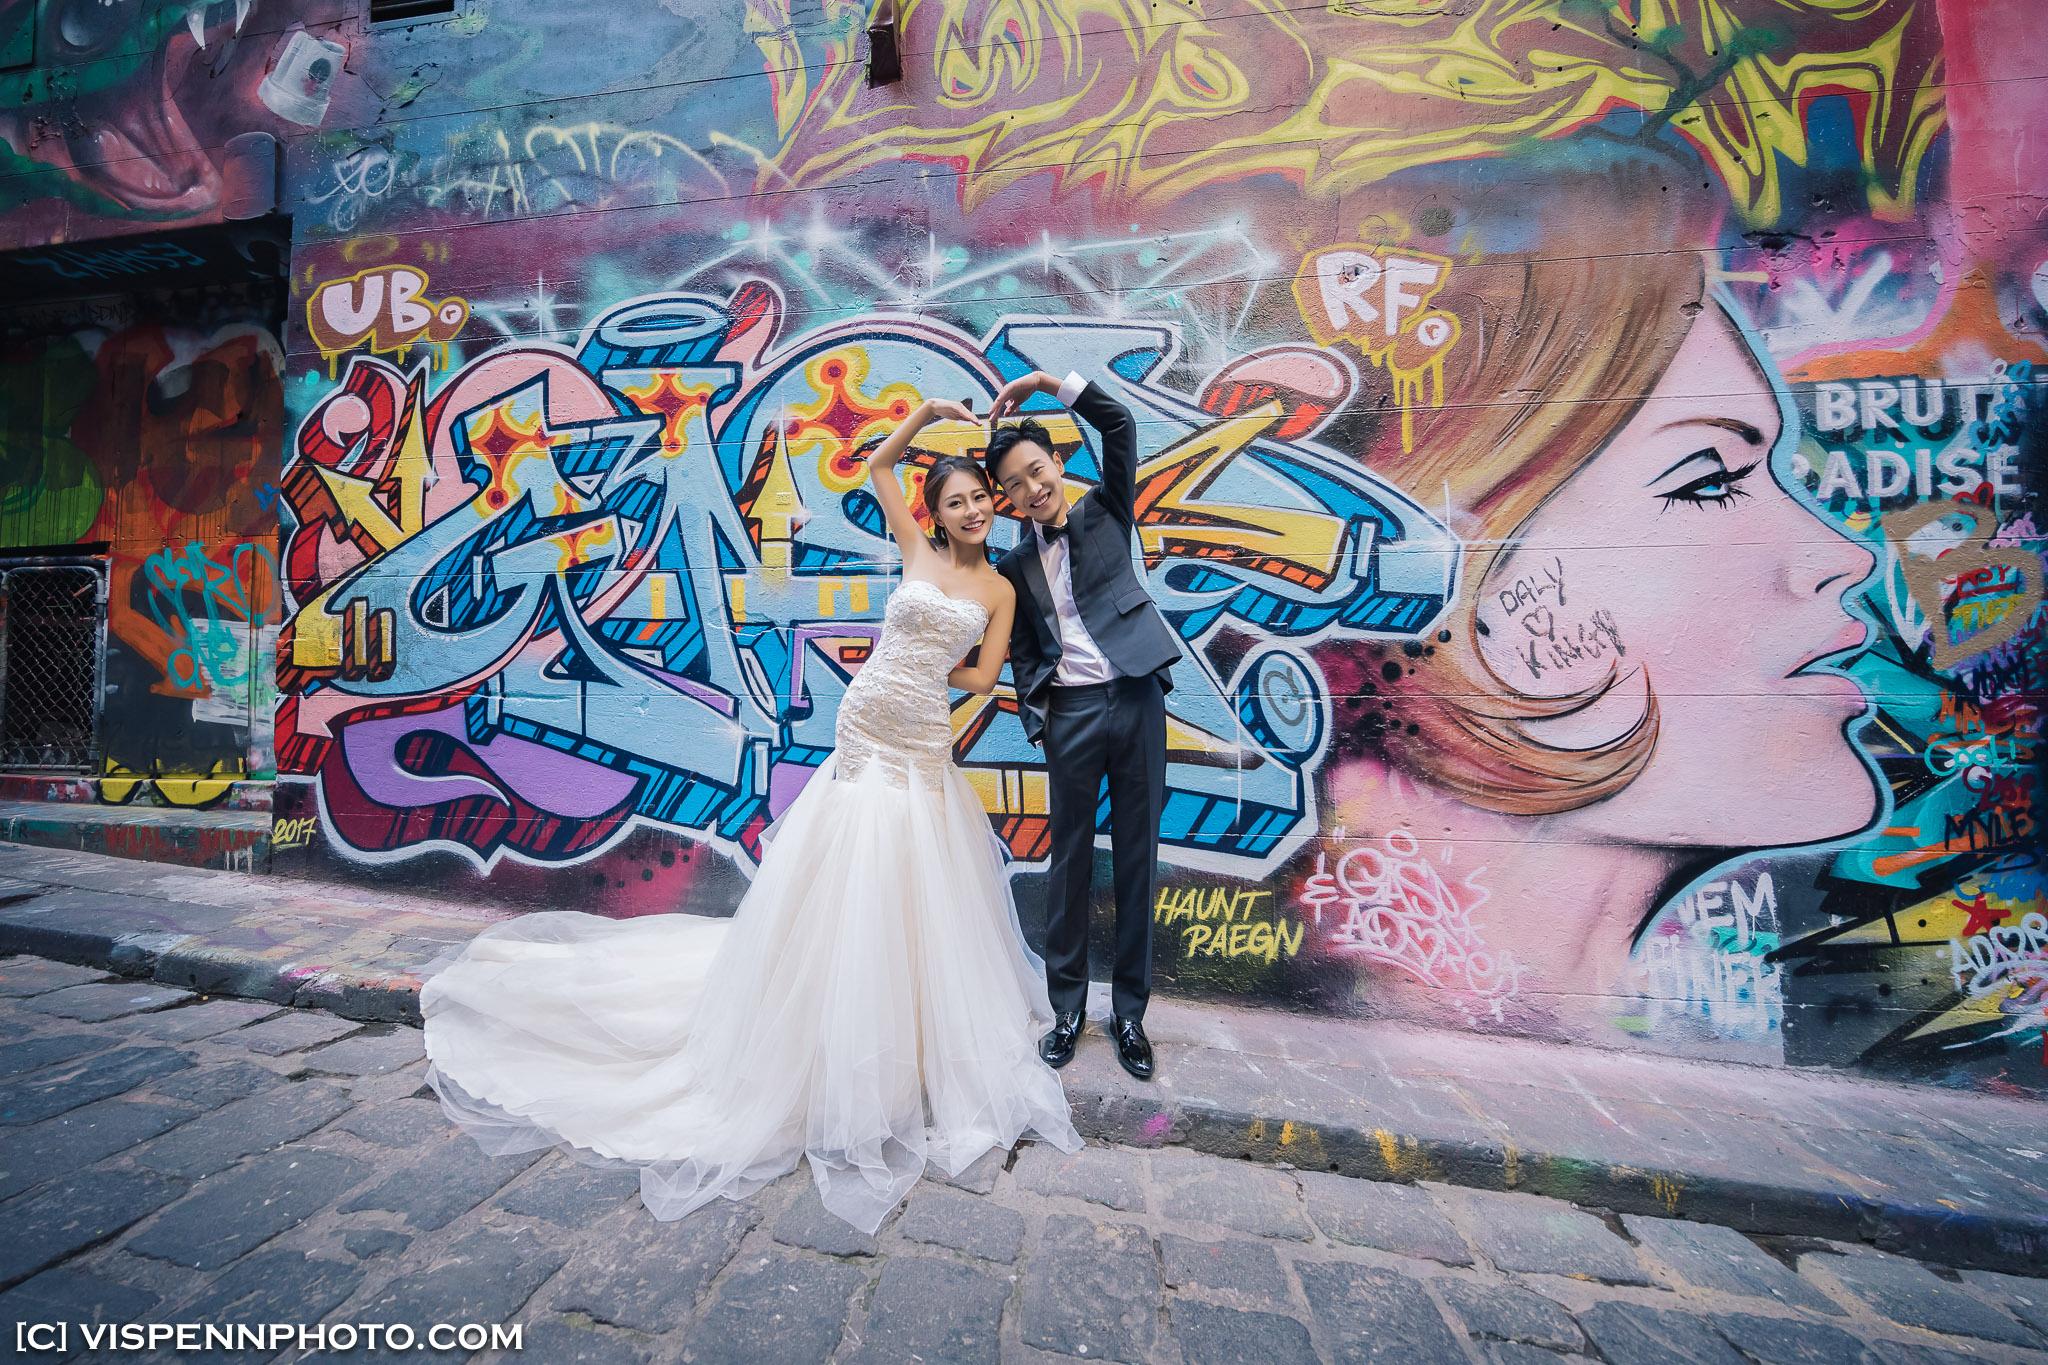 PRE WEDDING Photography Melbourne VISPENN 墨尔本 婚纱照 结婚照 婚纱摄影 5D4 1201